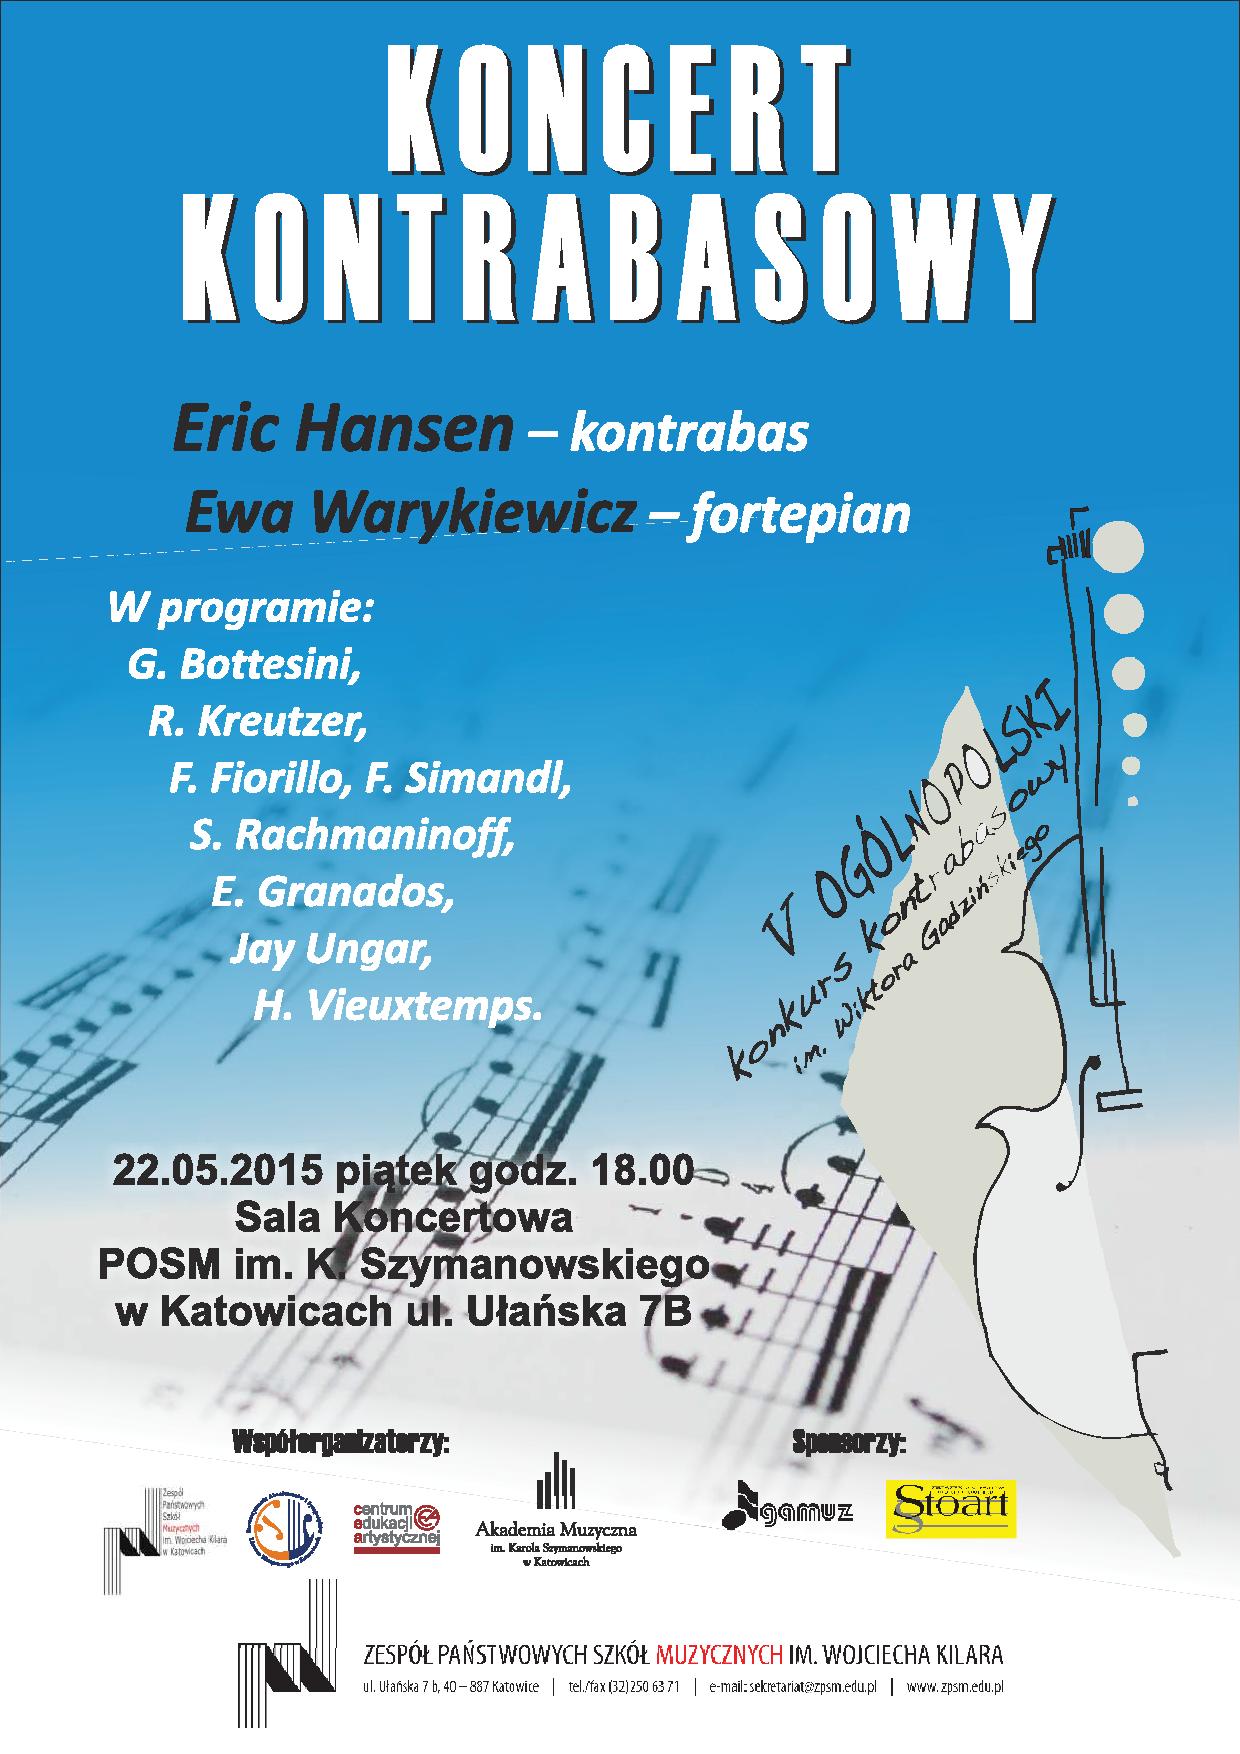 Konceert Kontrabasowy